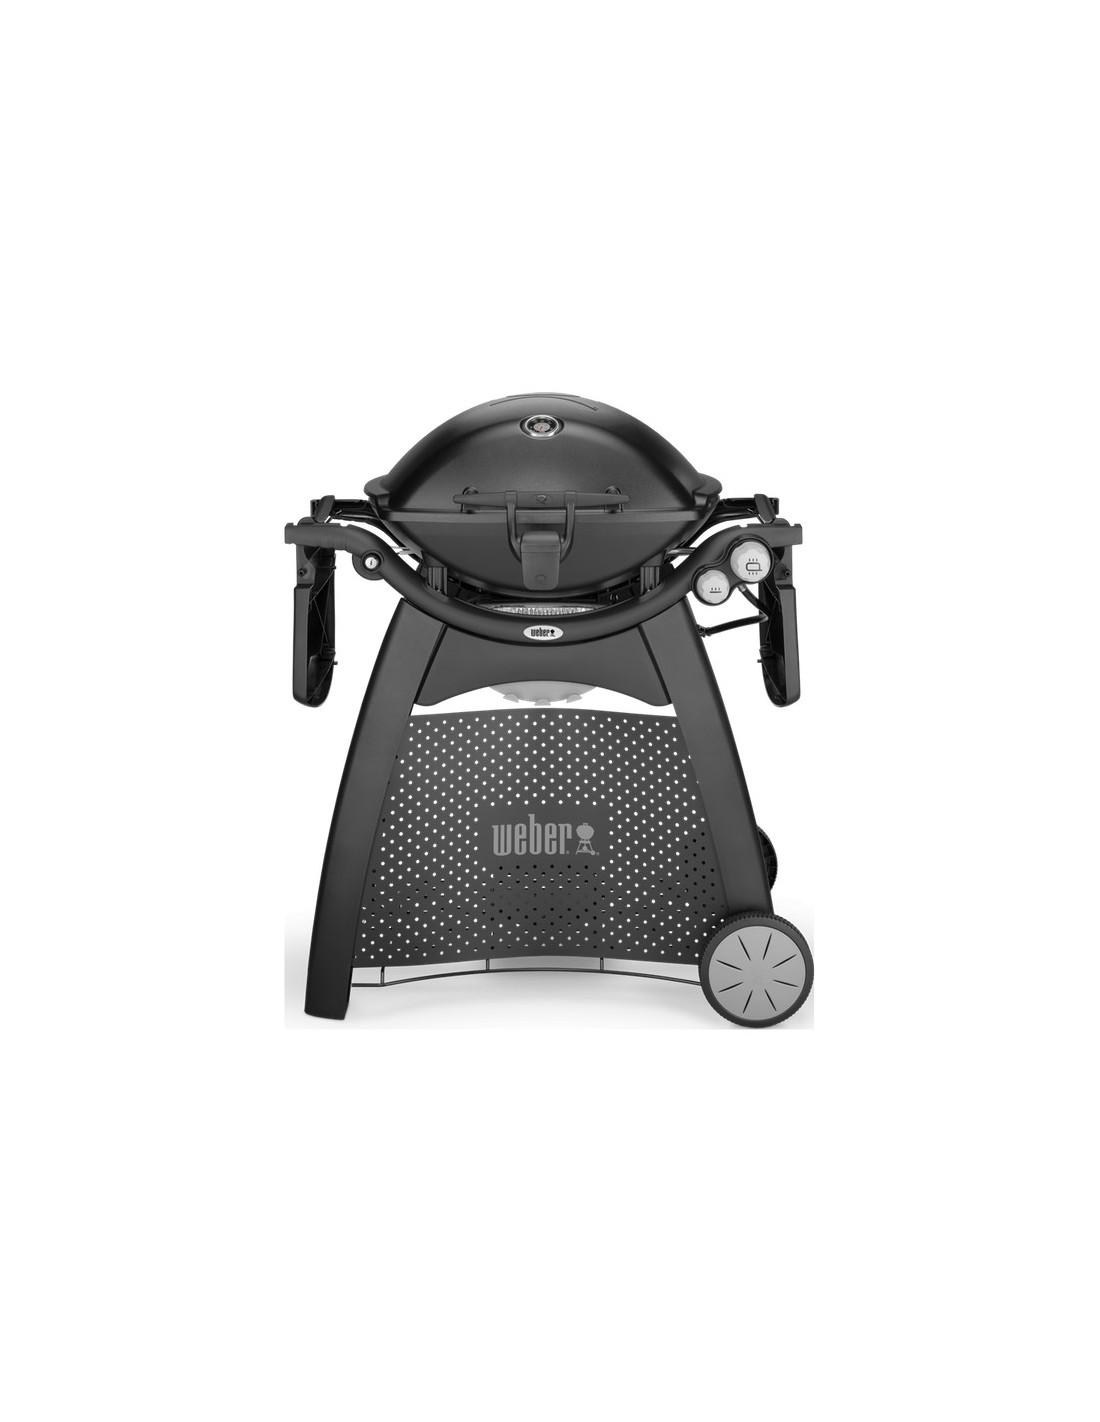 barbecue gaz q3200 black noir avec chariot plancha 6506 weber. Black Bedroom Furniture Sets. Home Design Ideas